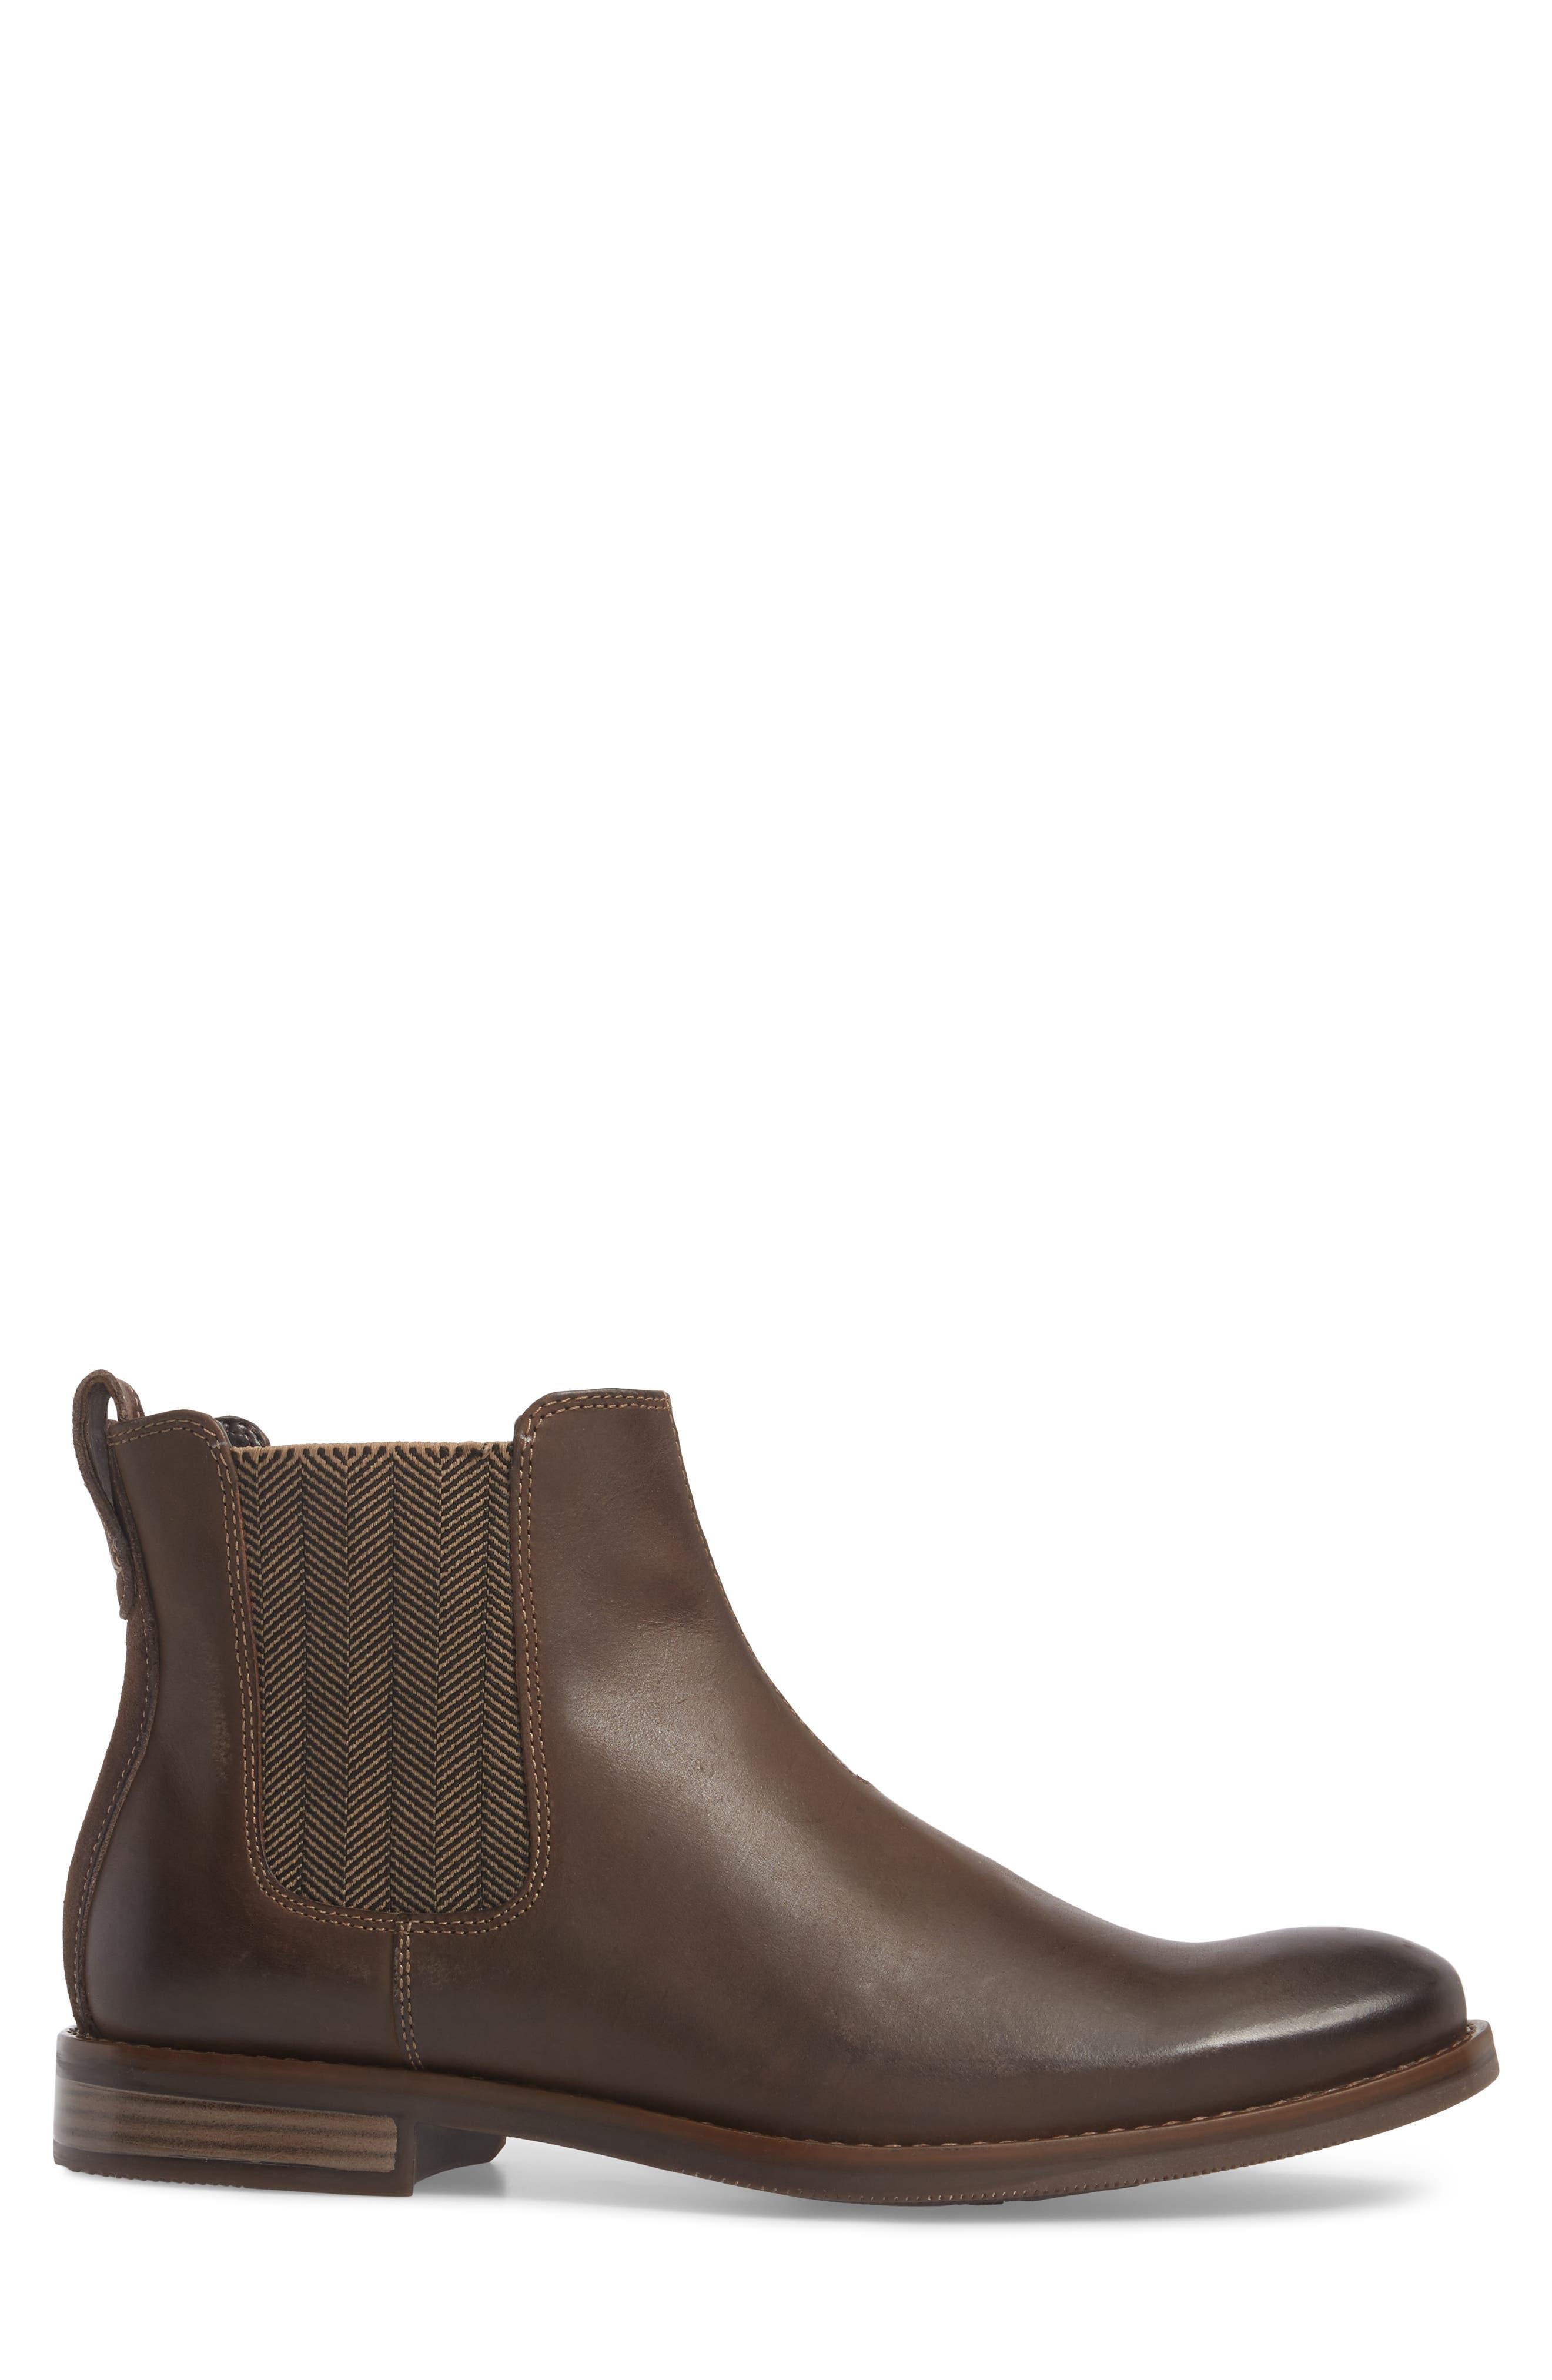 Wynstin Chelsea Boot,                             Alternate thumbnail 3, color,                             Dark Bitter Chocolate Leather